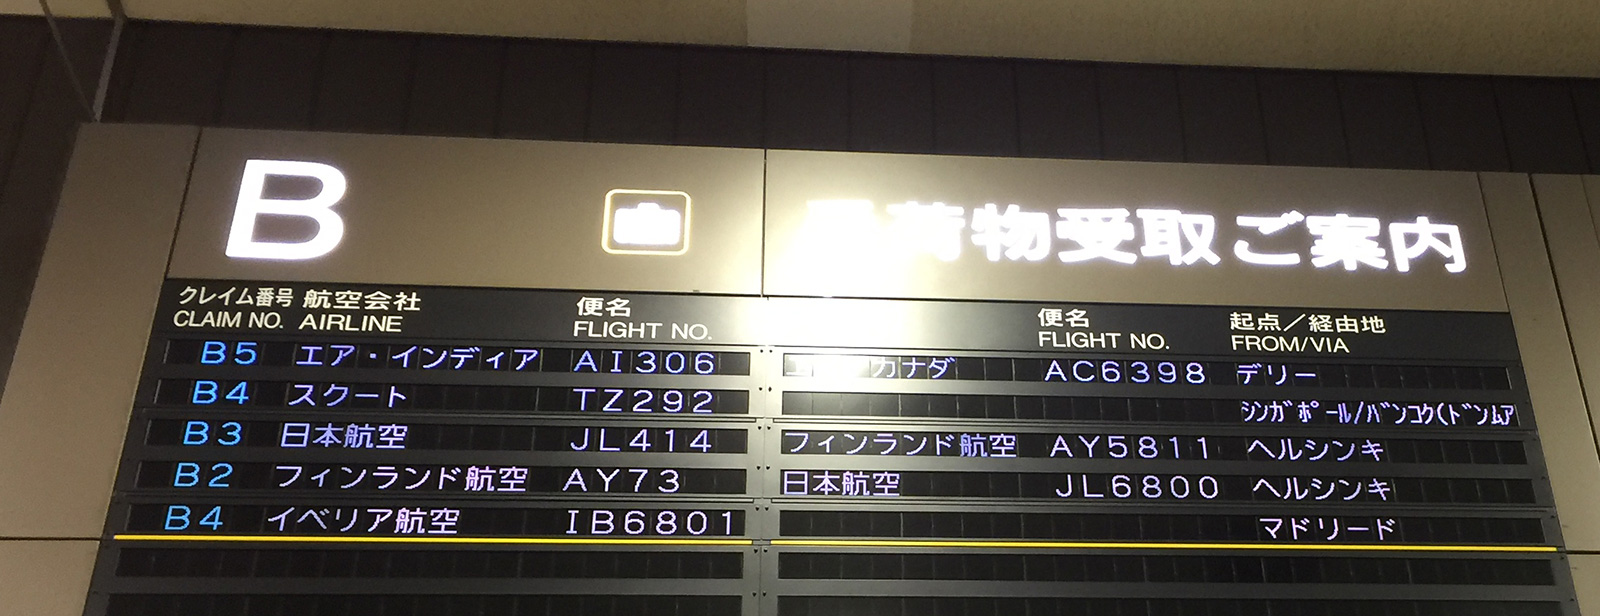 Madrid e Iberia en la lista de destinos de Narita